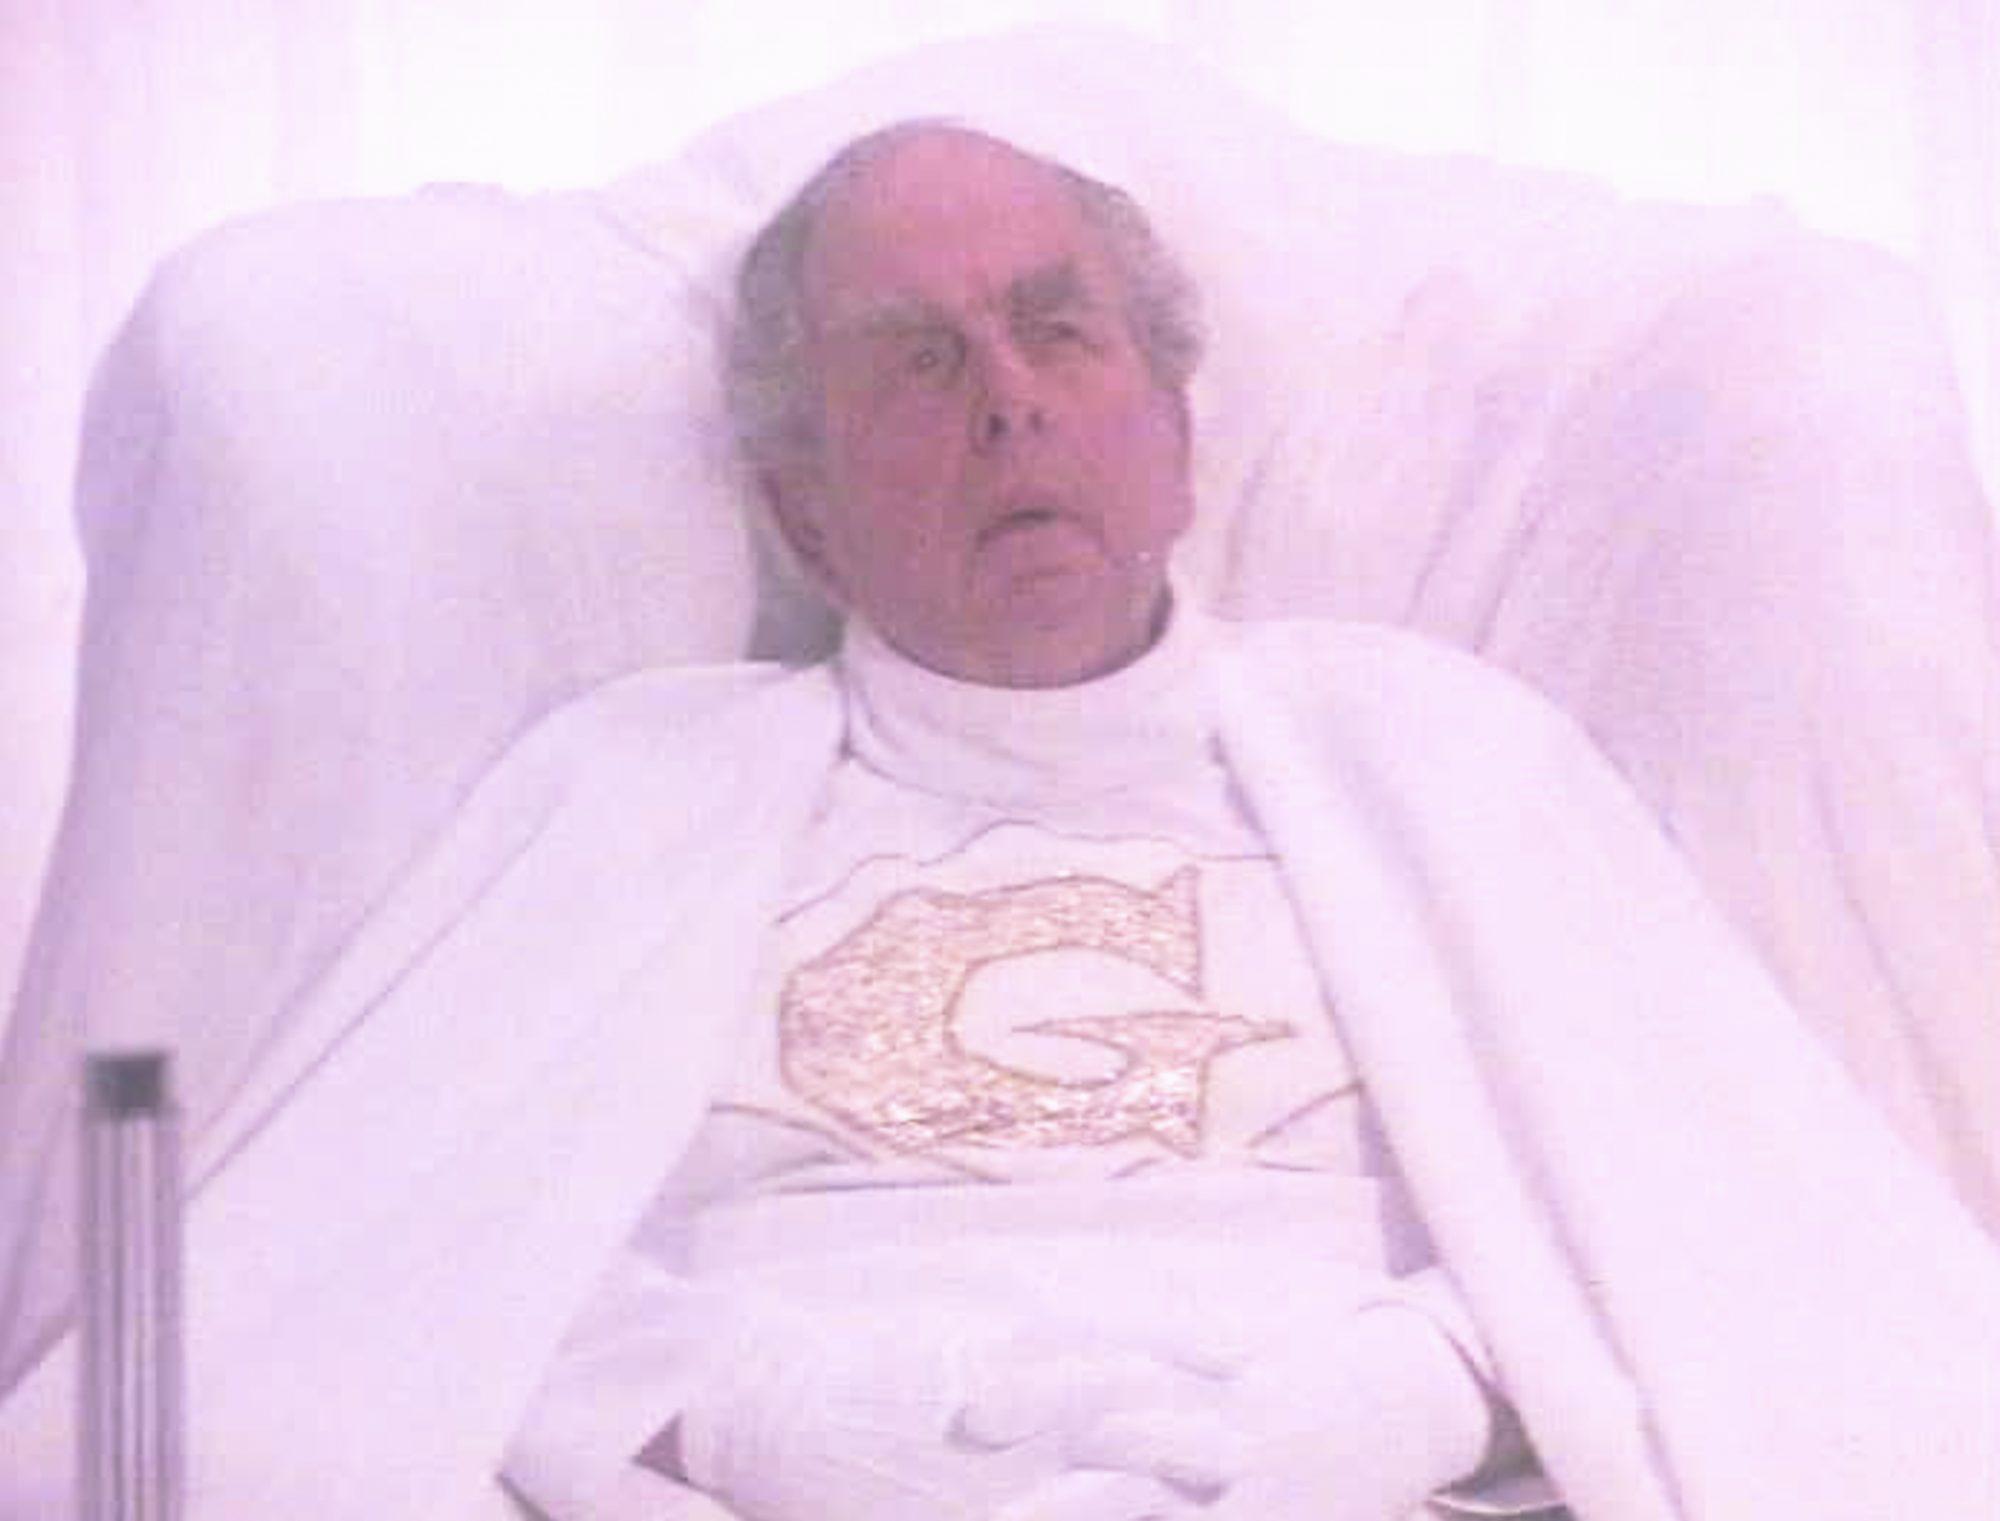 Second Time Lucky (1984) (screen grab)Robert Morley